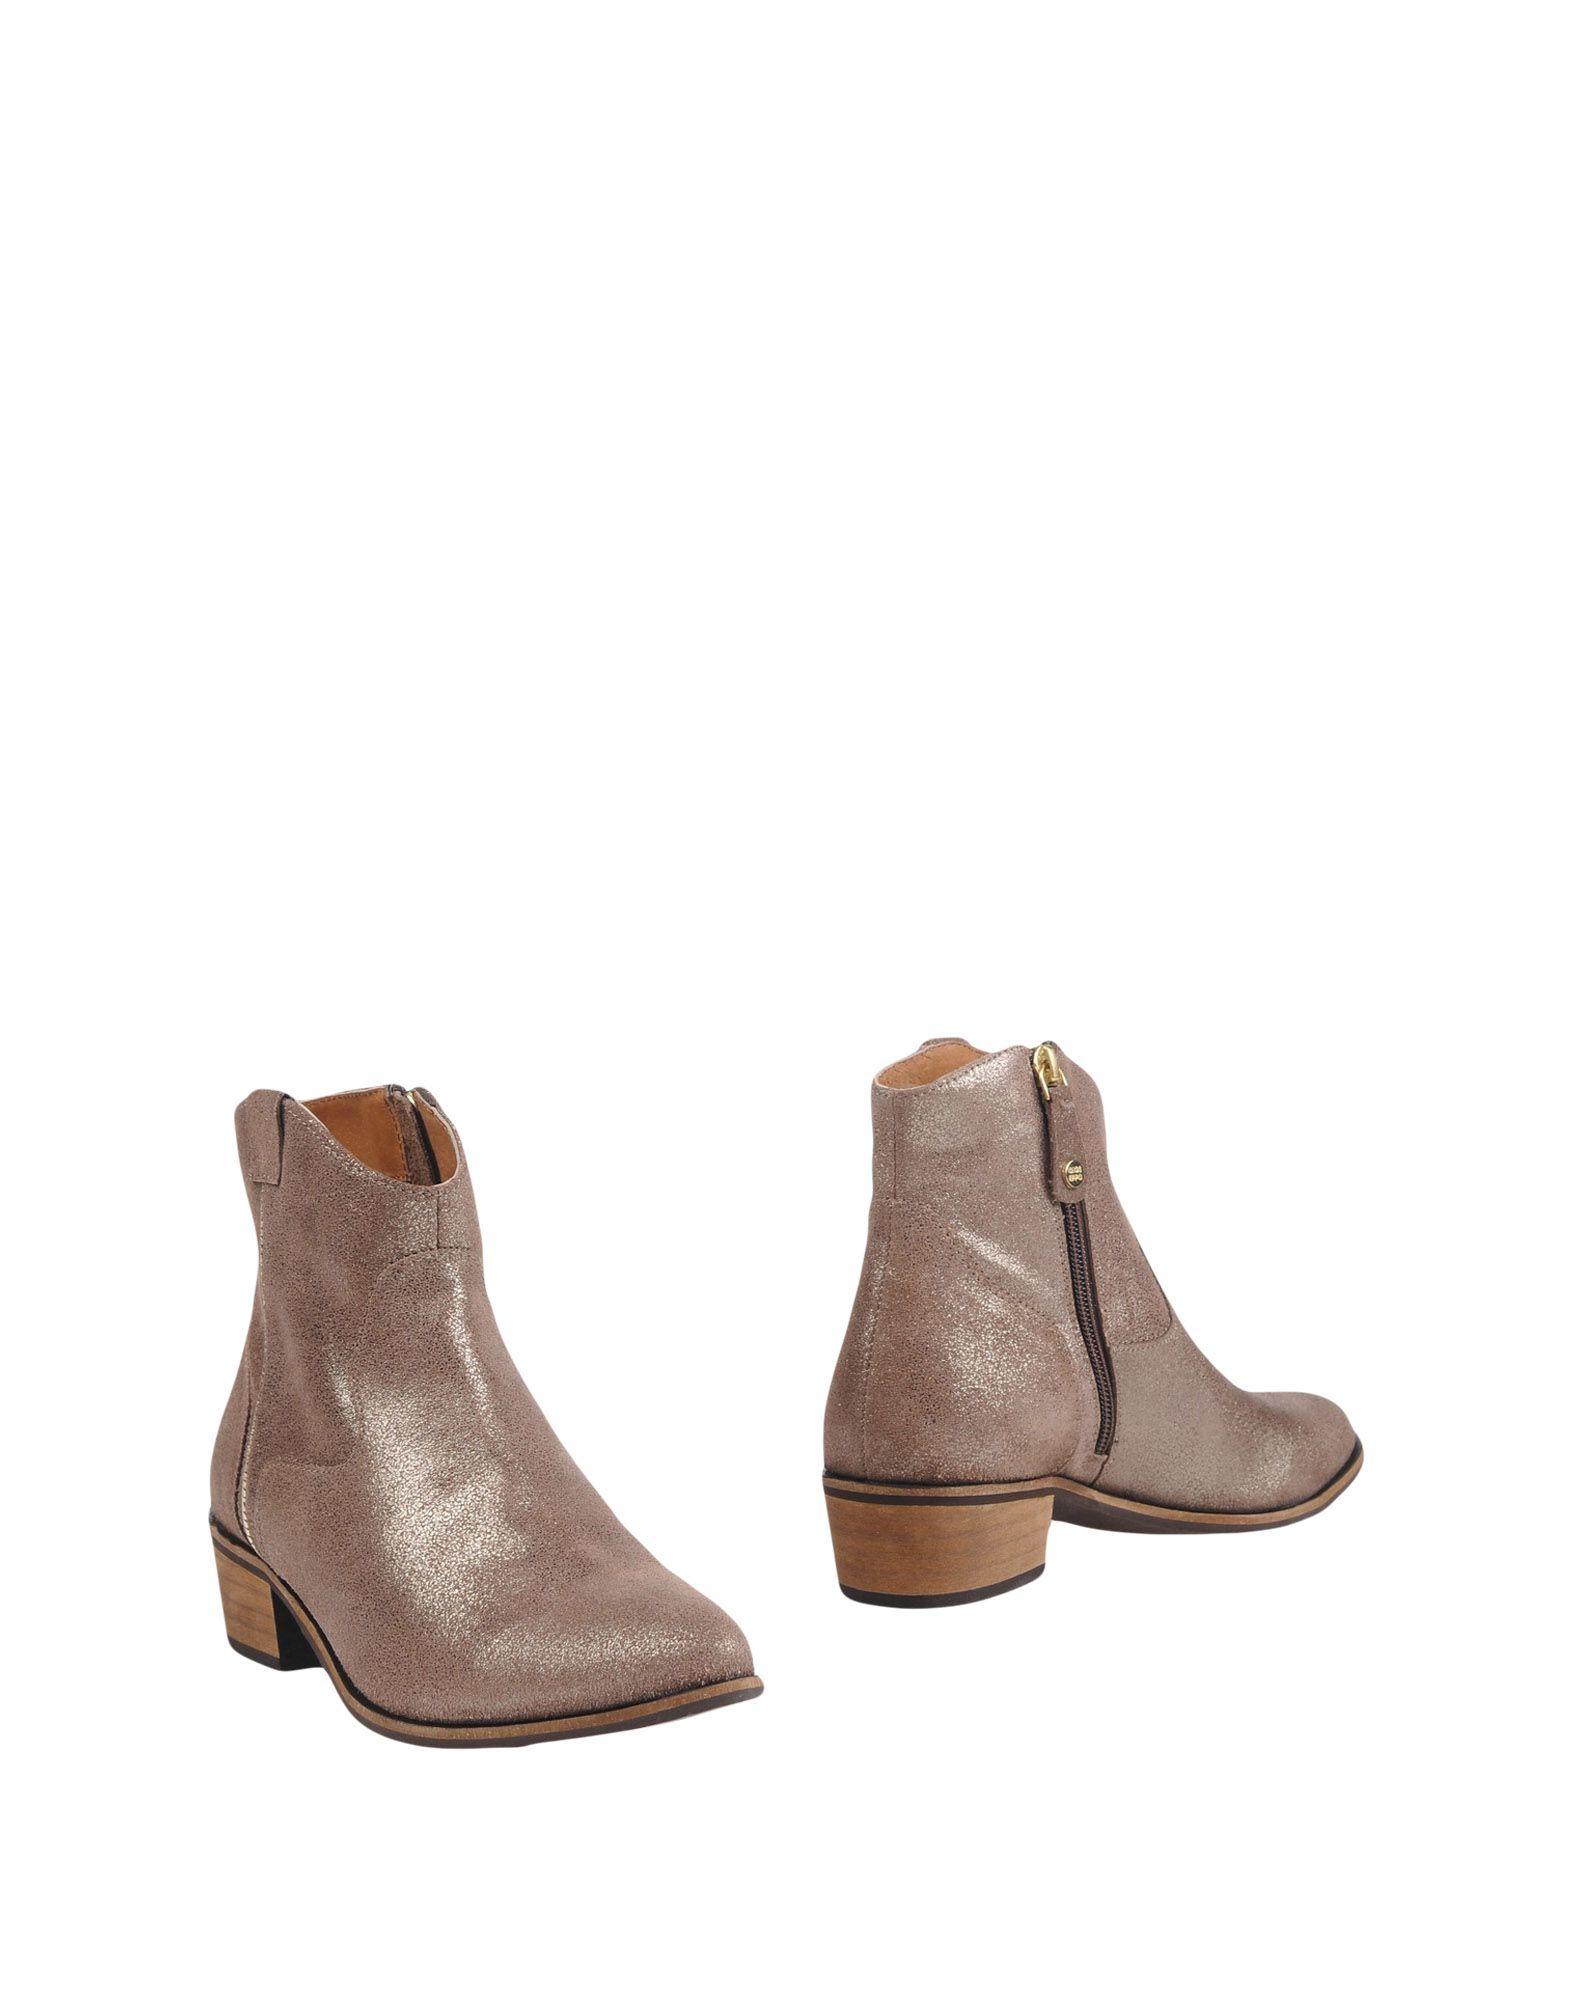 Gioseppo Stiefelette Damen  11223998XI Gute Qualität beliebte Schuhe